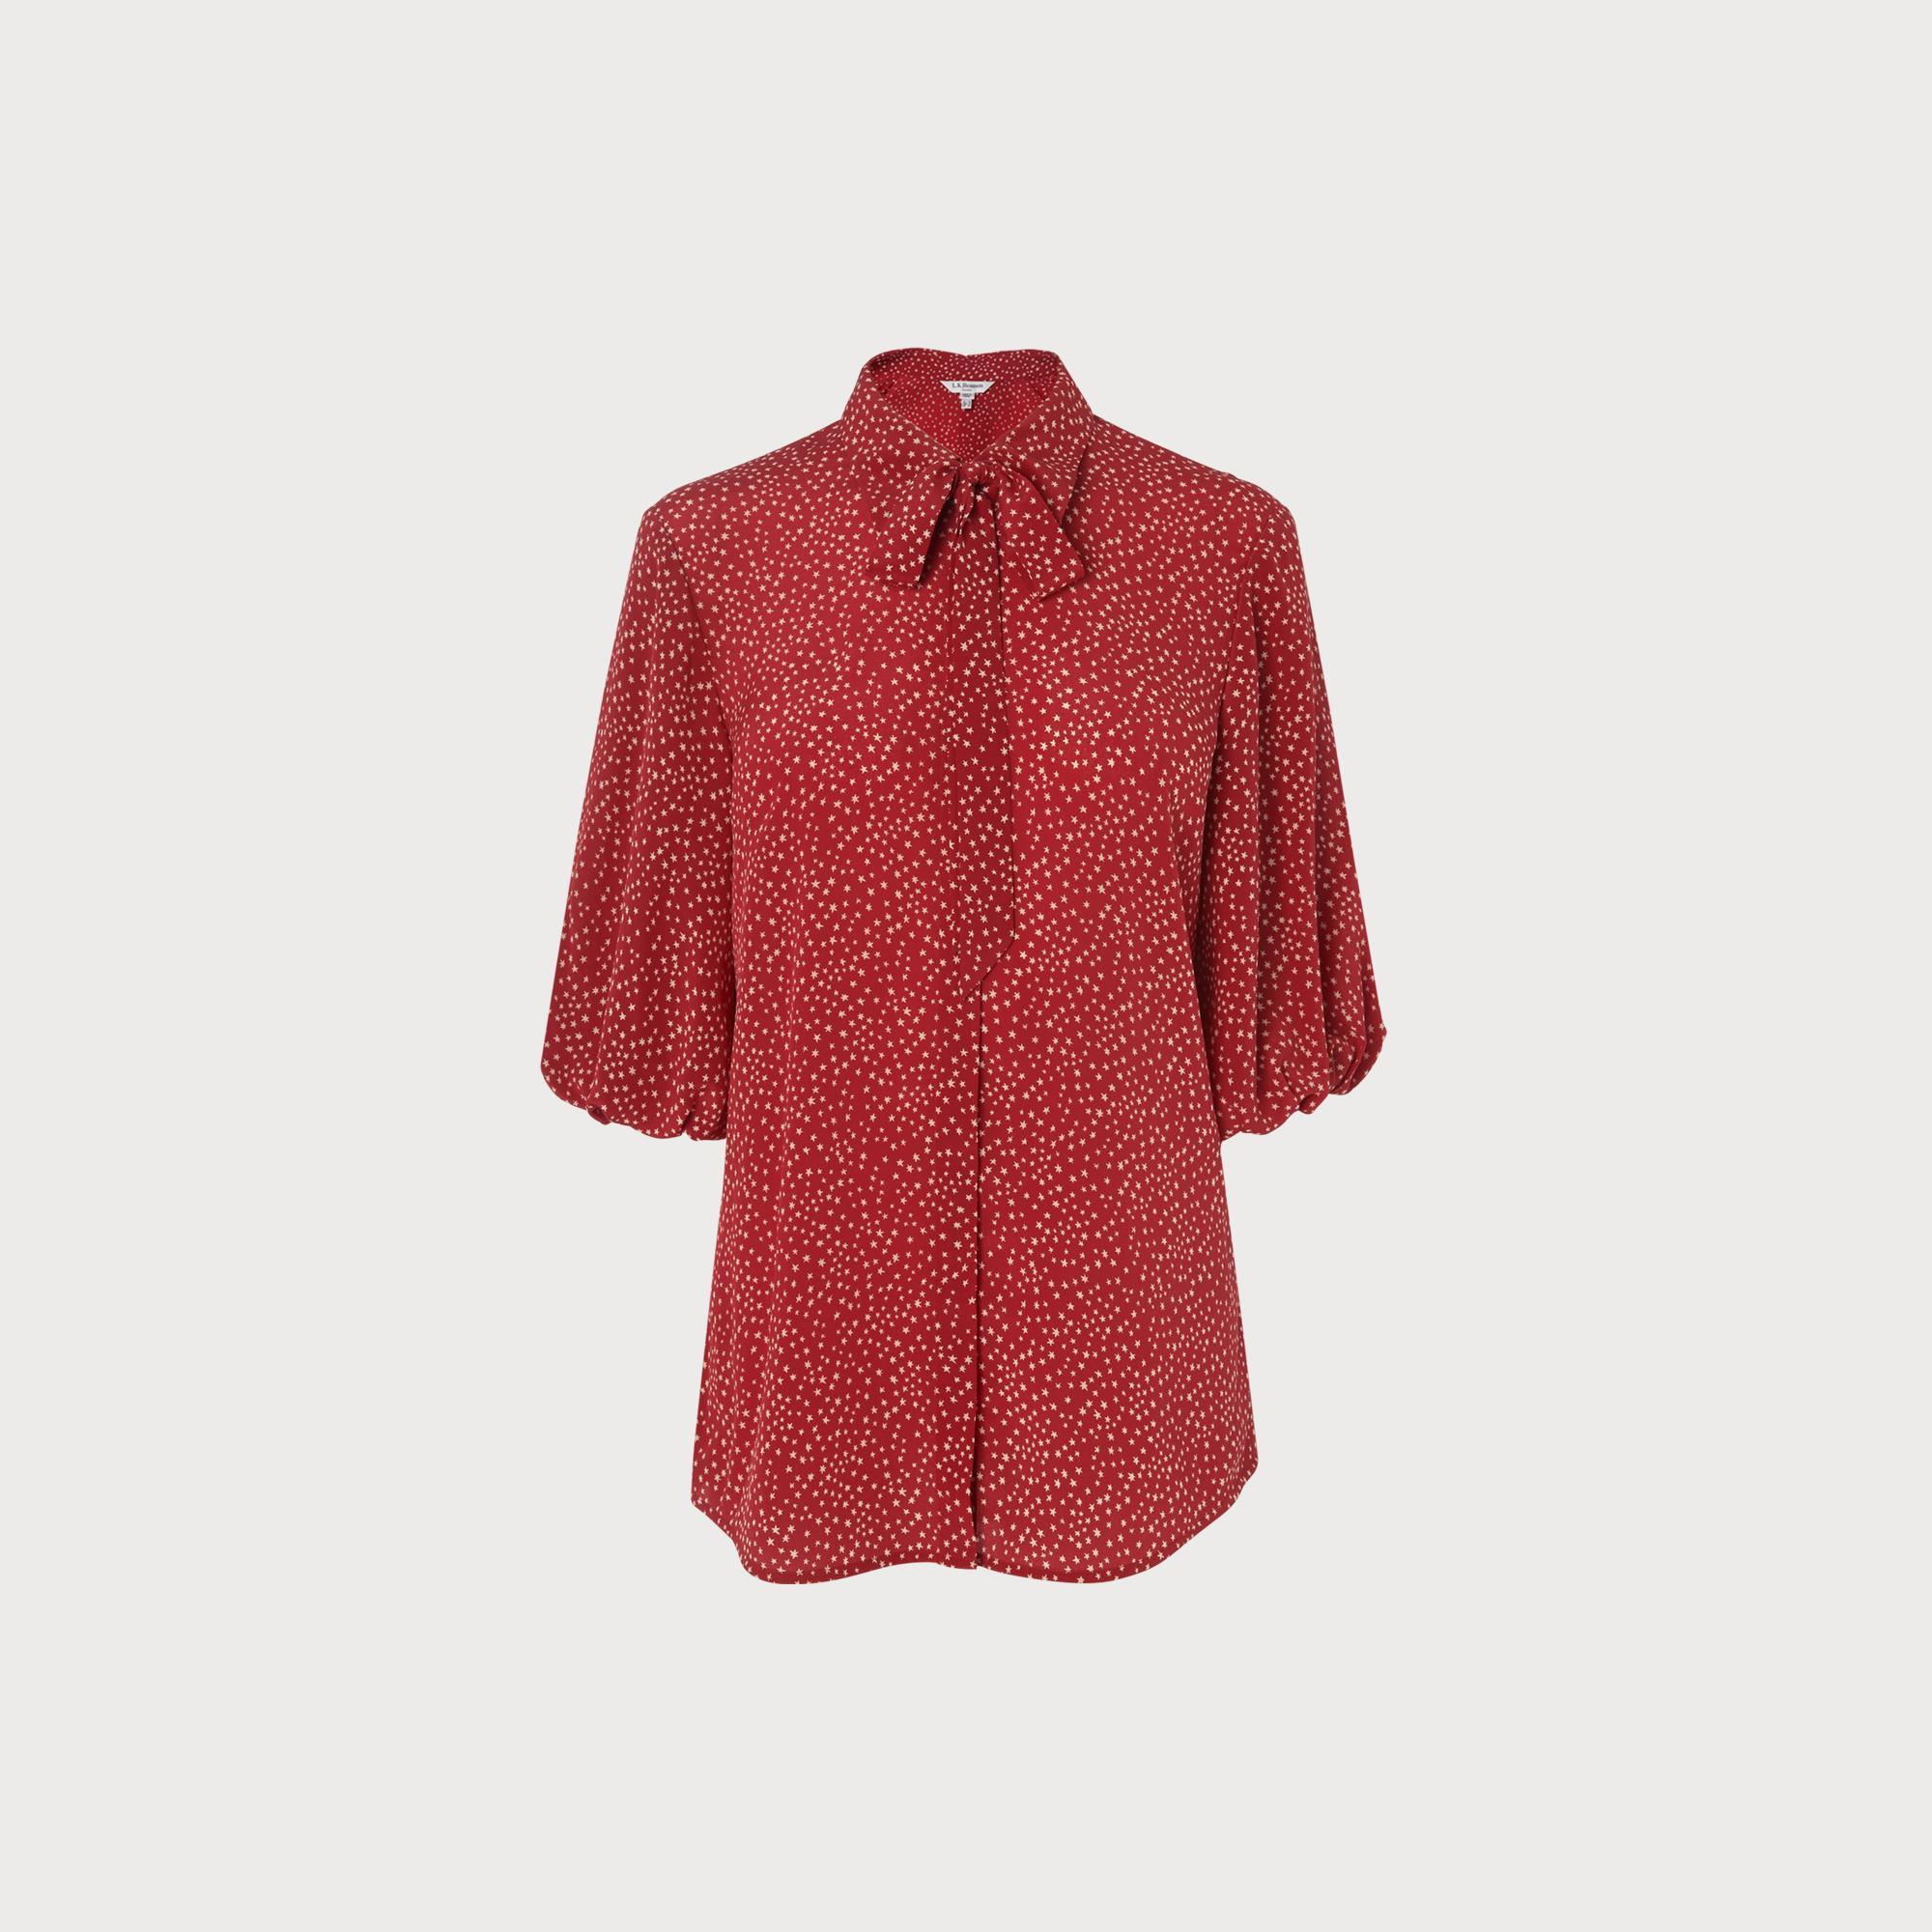 064f6a3ecdab9 L.K.Bennett Silk Tillila Woven Top in Red - Lyst